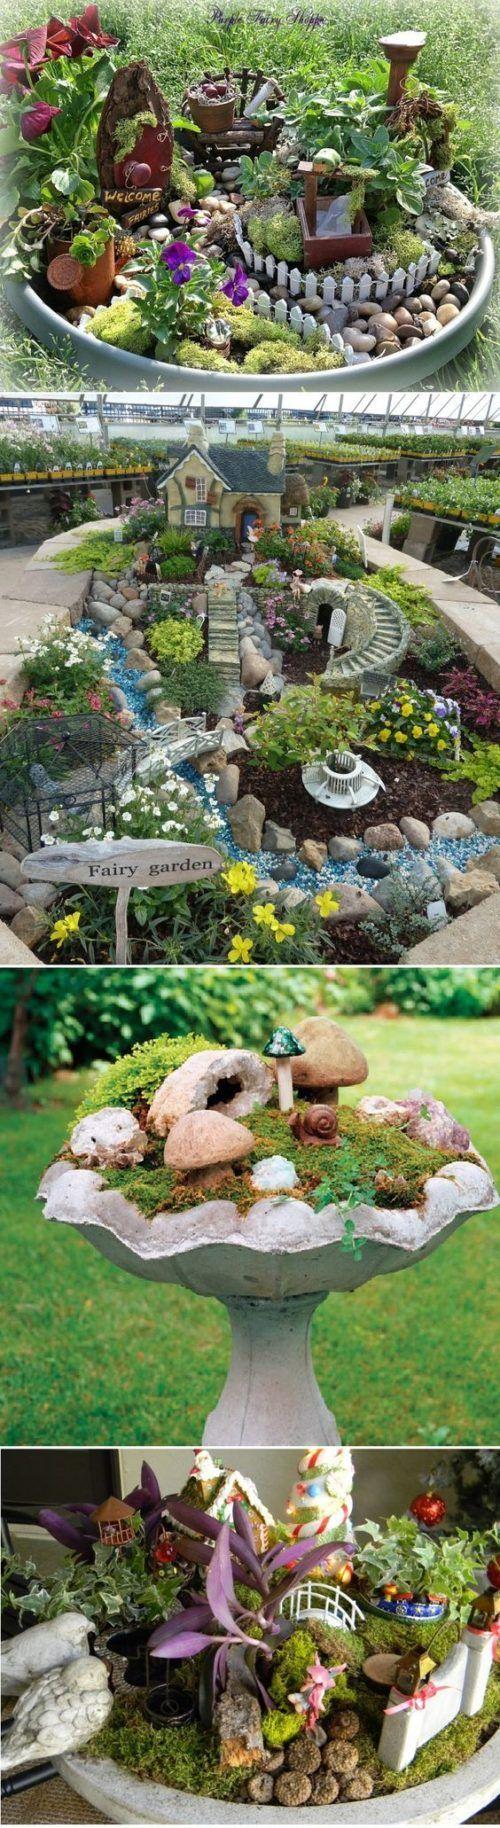 460 best Outdoor living images on Pinterest | Home, Backyard ideas ...